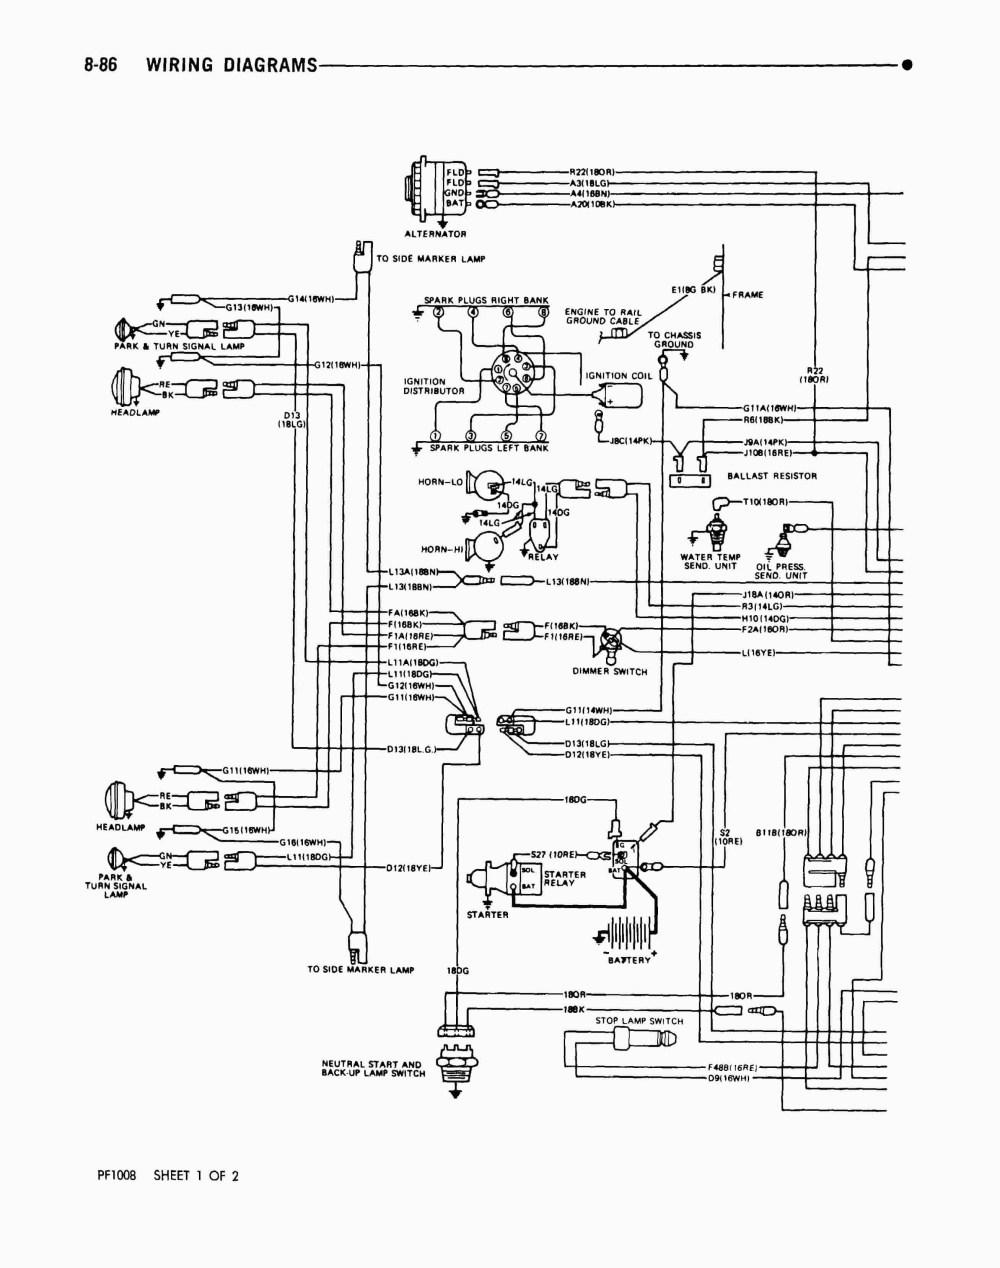 medium resolution of 86 winnebago fuel tank selector valve wiring diagram schematic 1984 winnebago wiring diagrams wiring diagram manual for 1986 winnebago